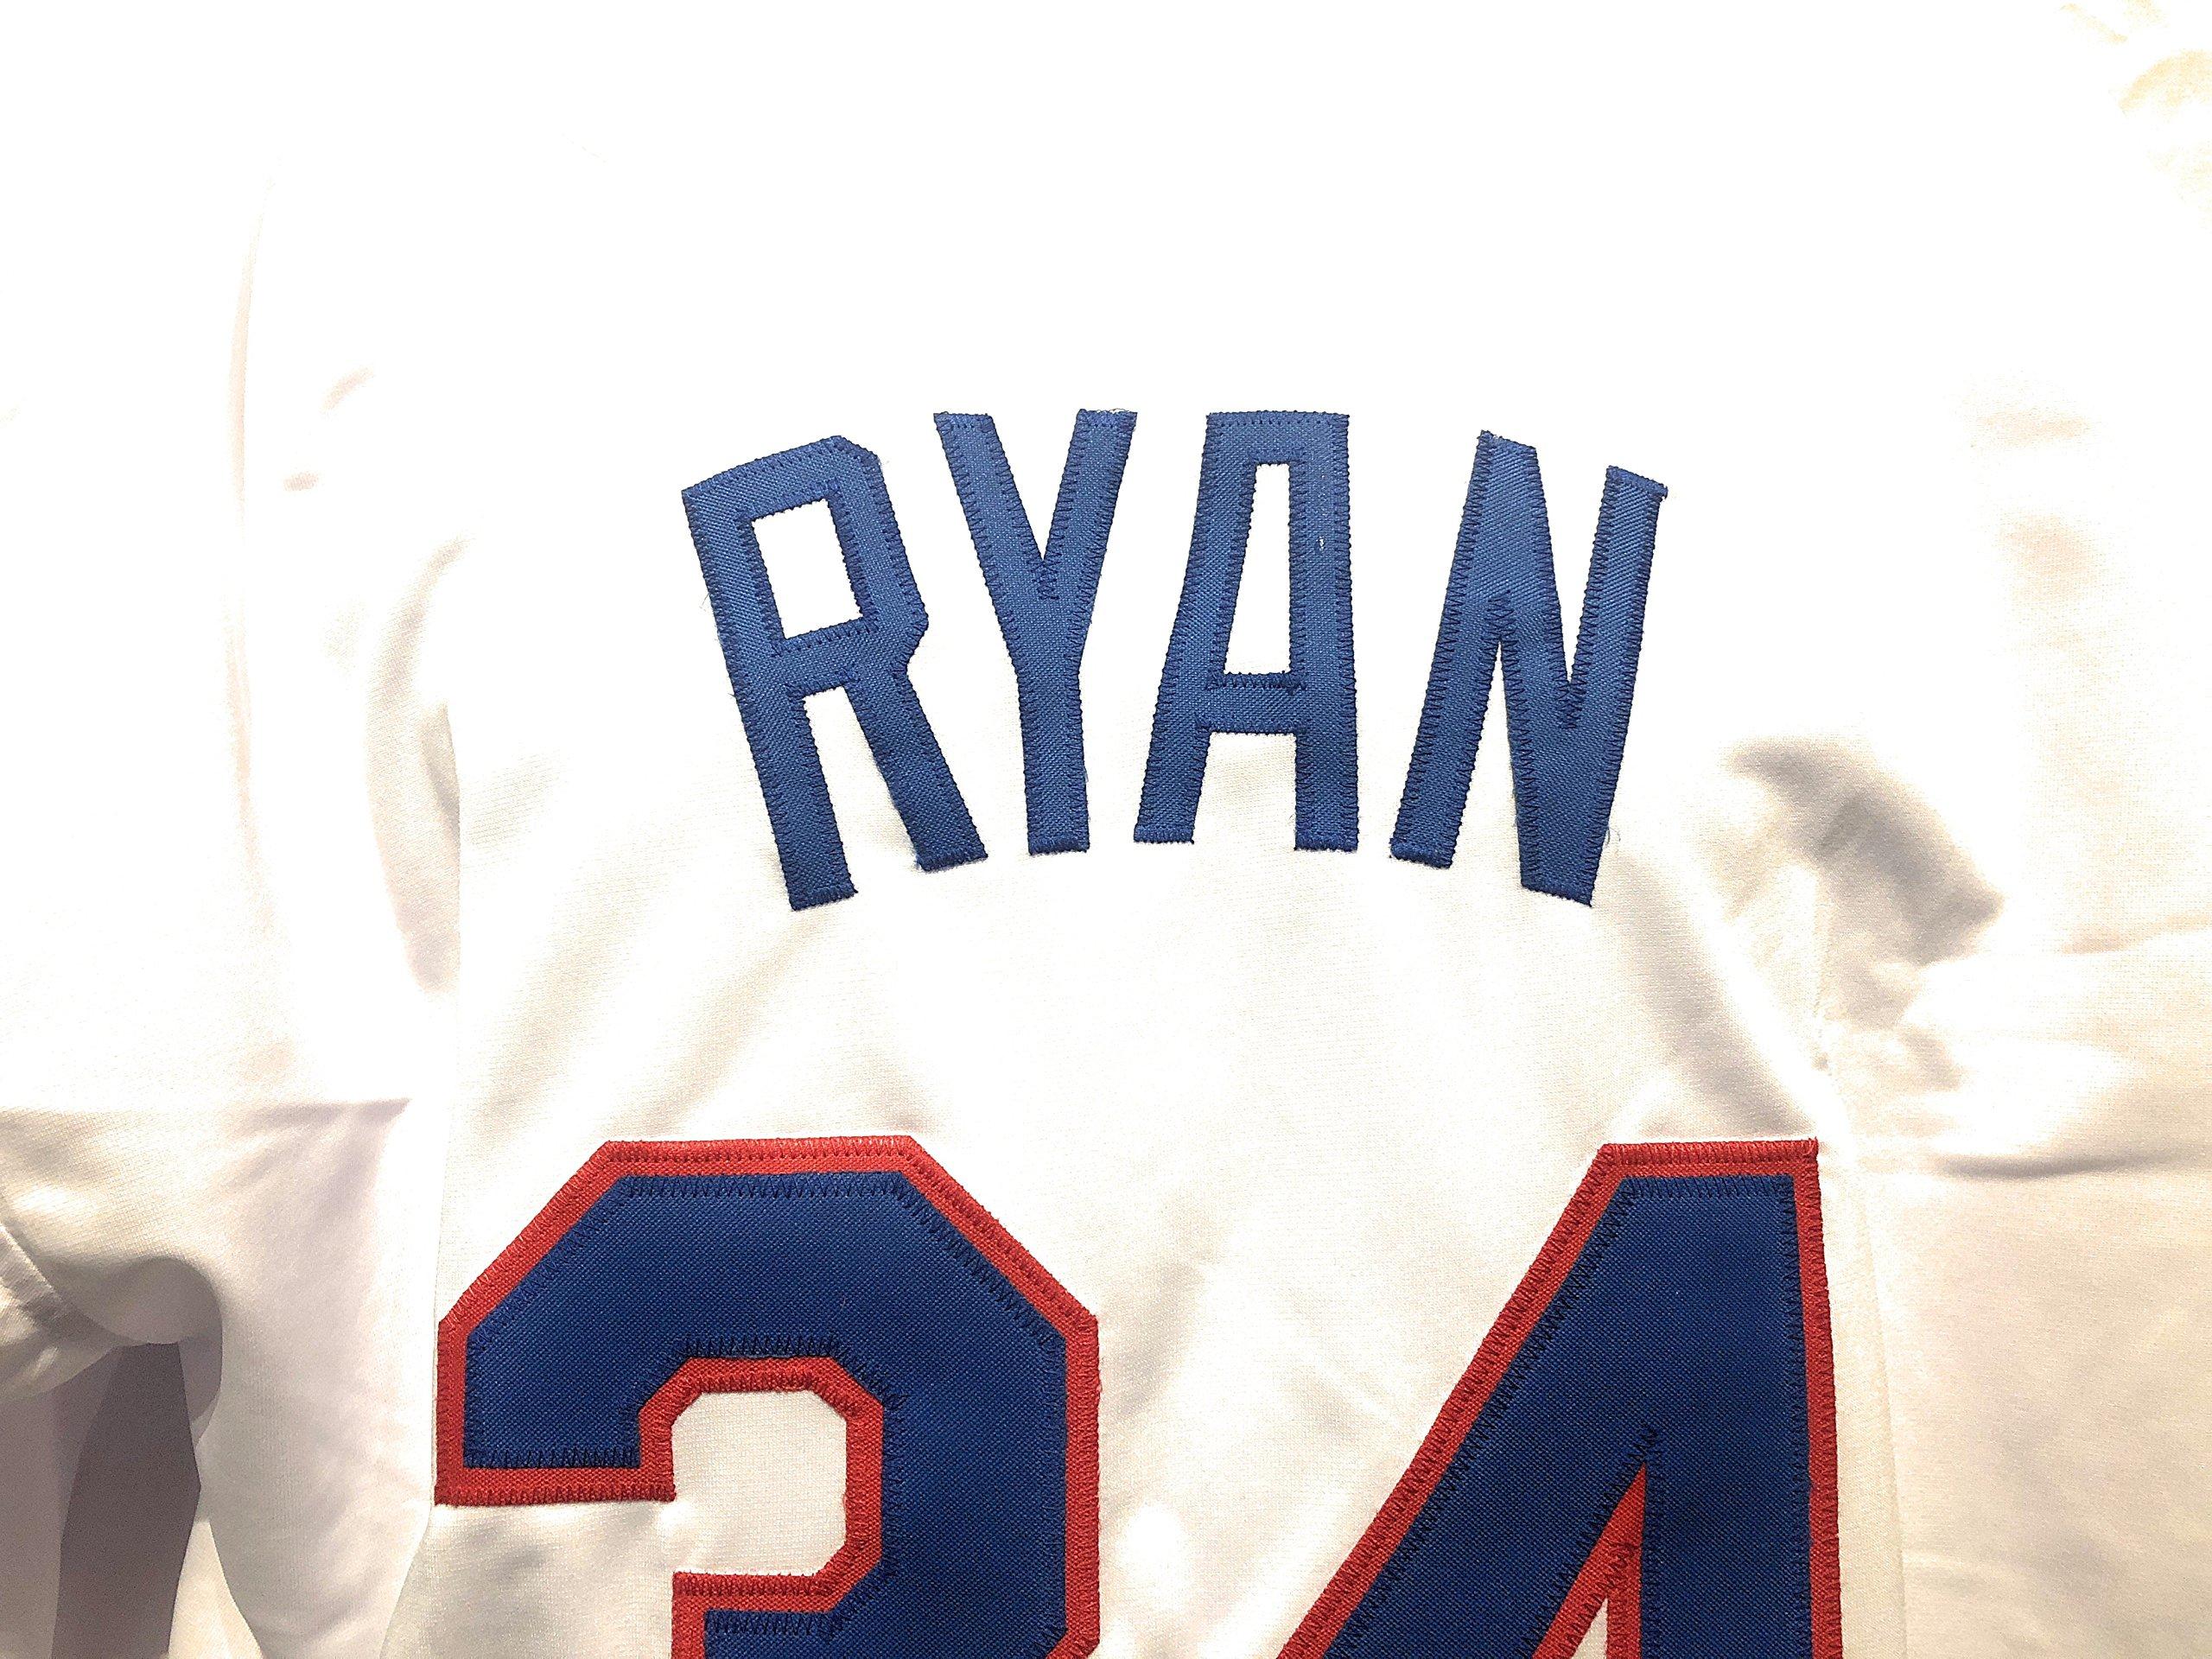 Nolan Ryan Texans Rangers Signed Autograph White Custom Jersey Nolan Ryan Hologram Certified